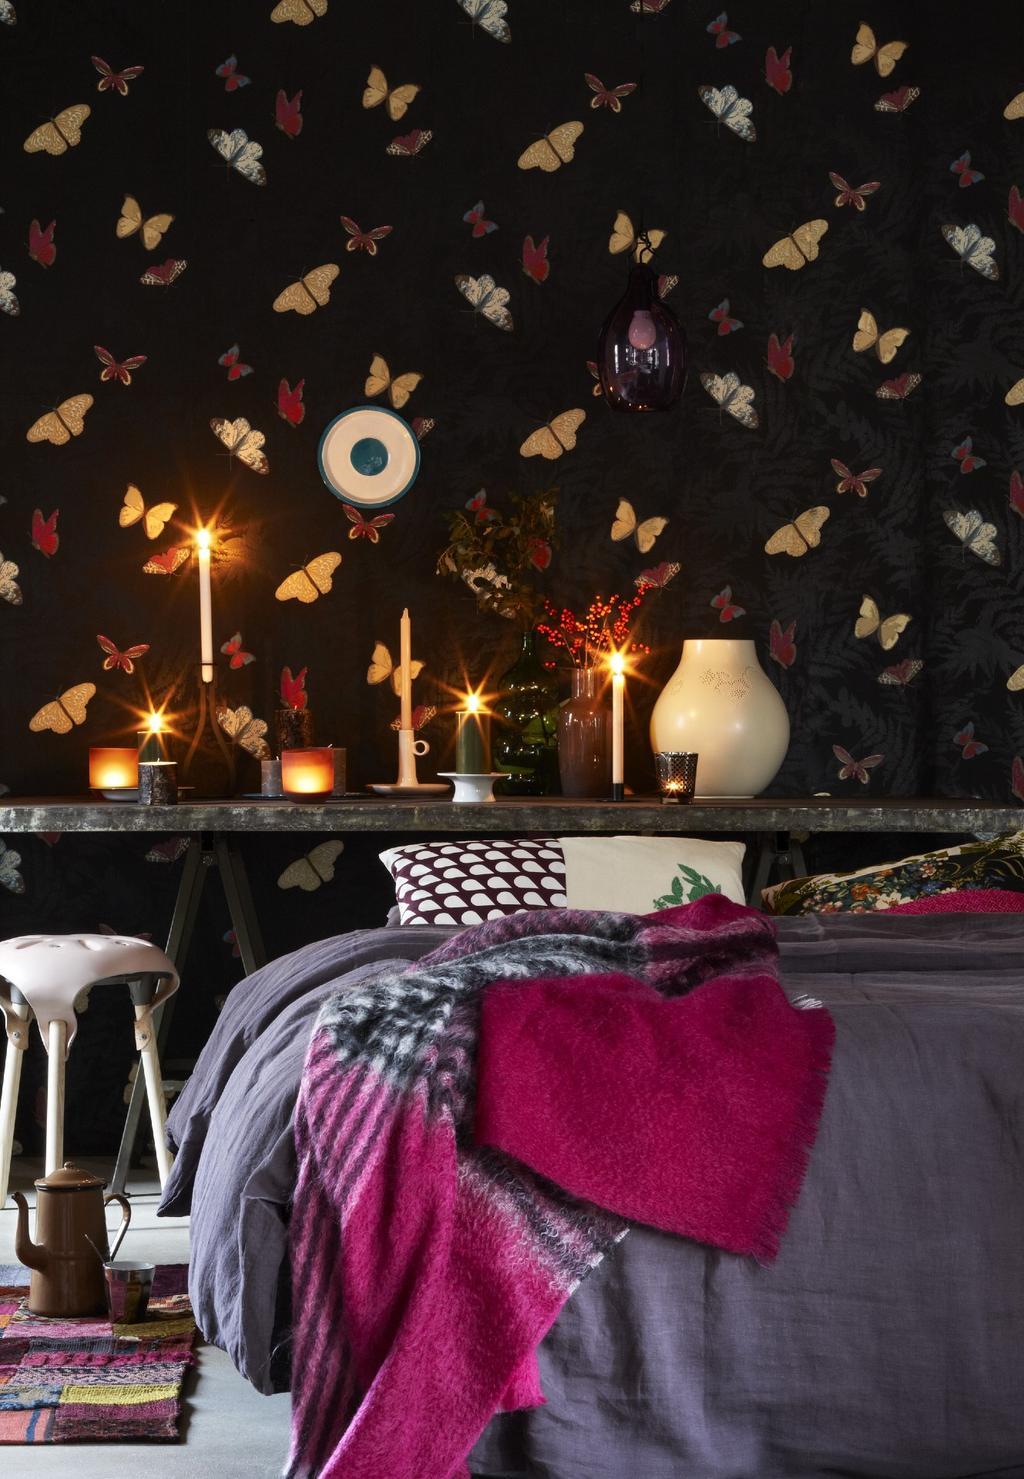 Slaapkamerideeën: creëer meer sfeer met een printbehang